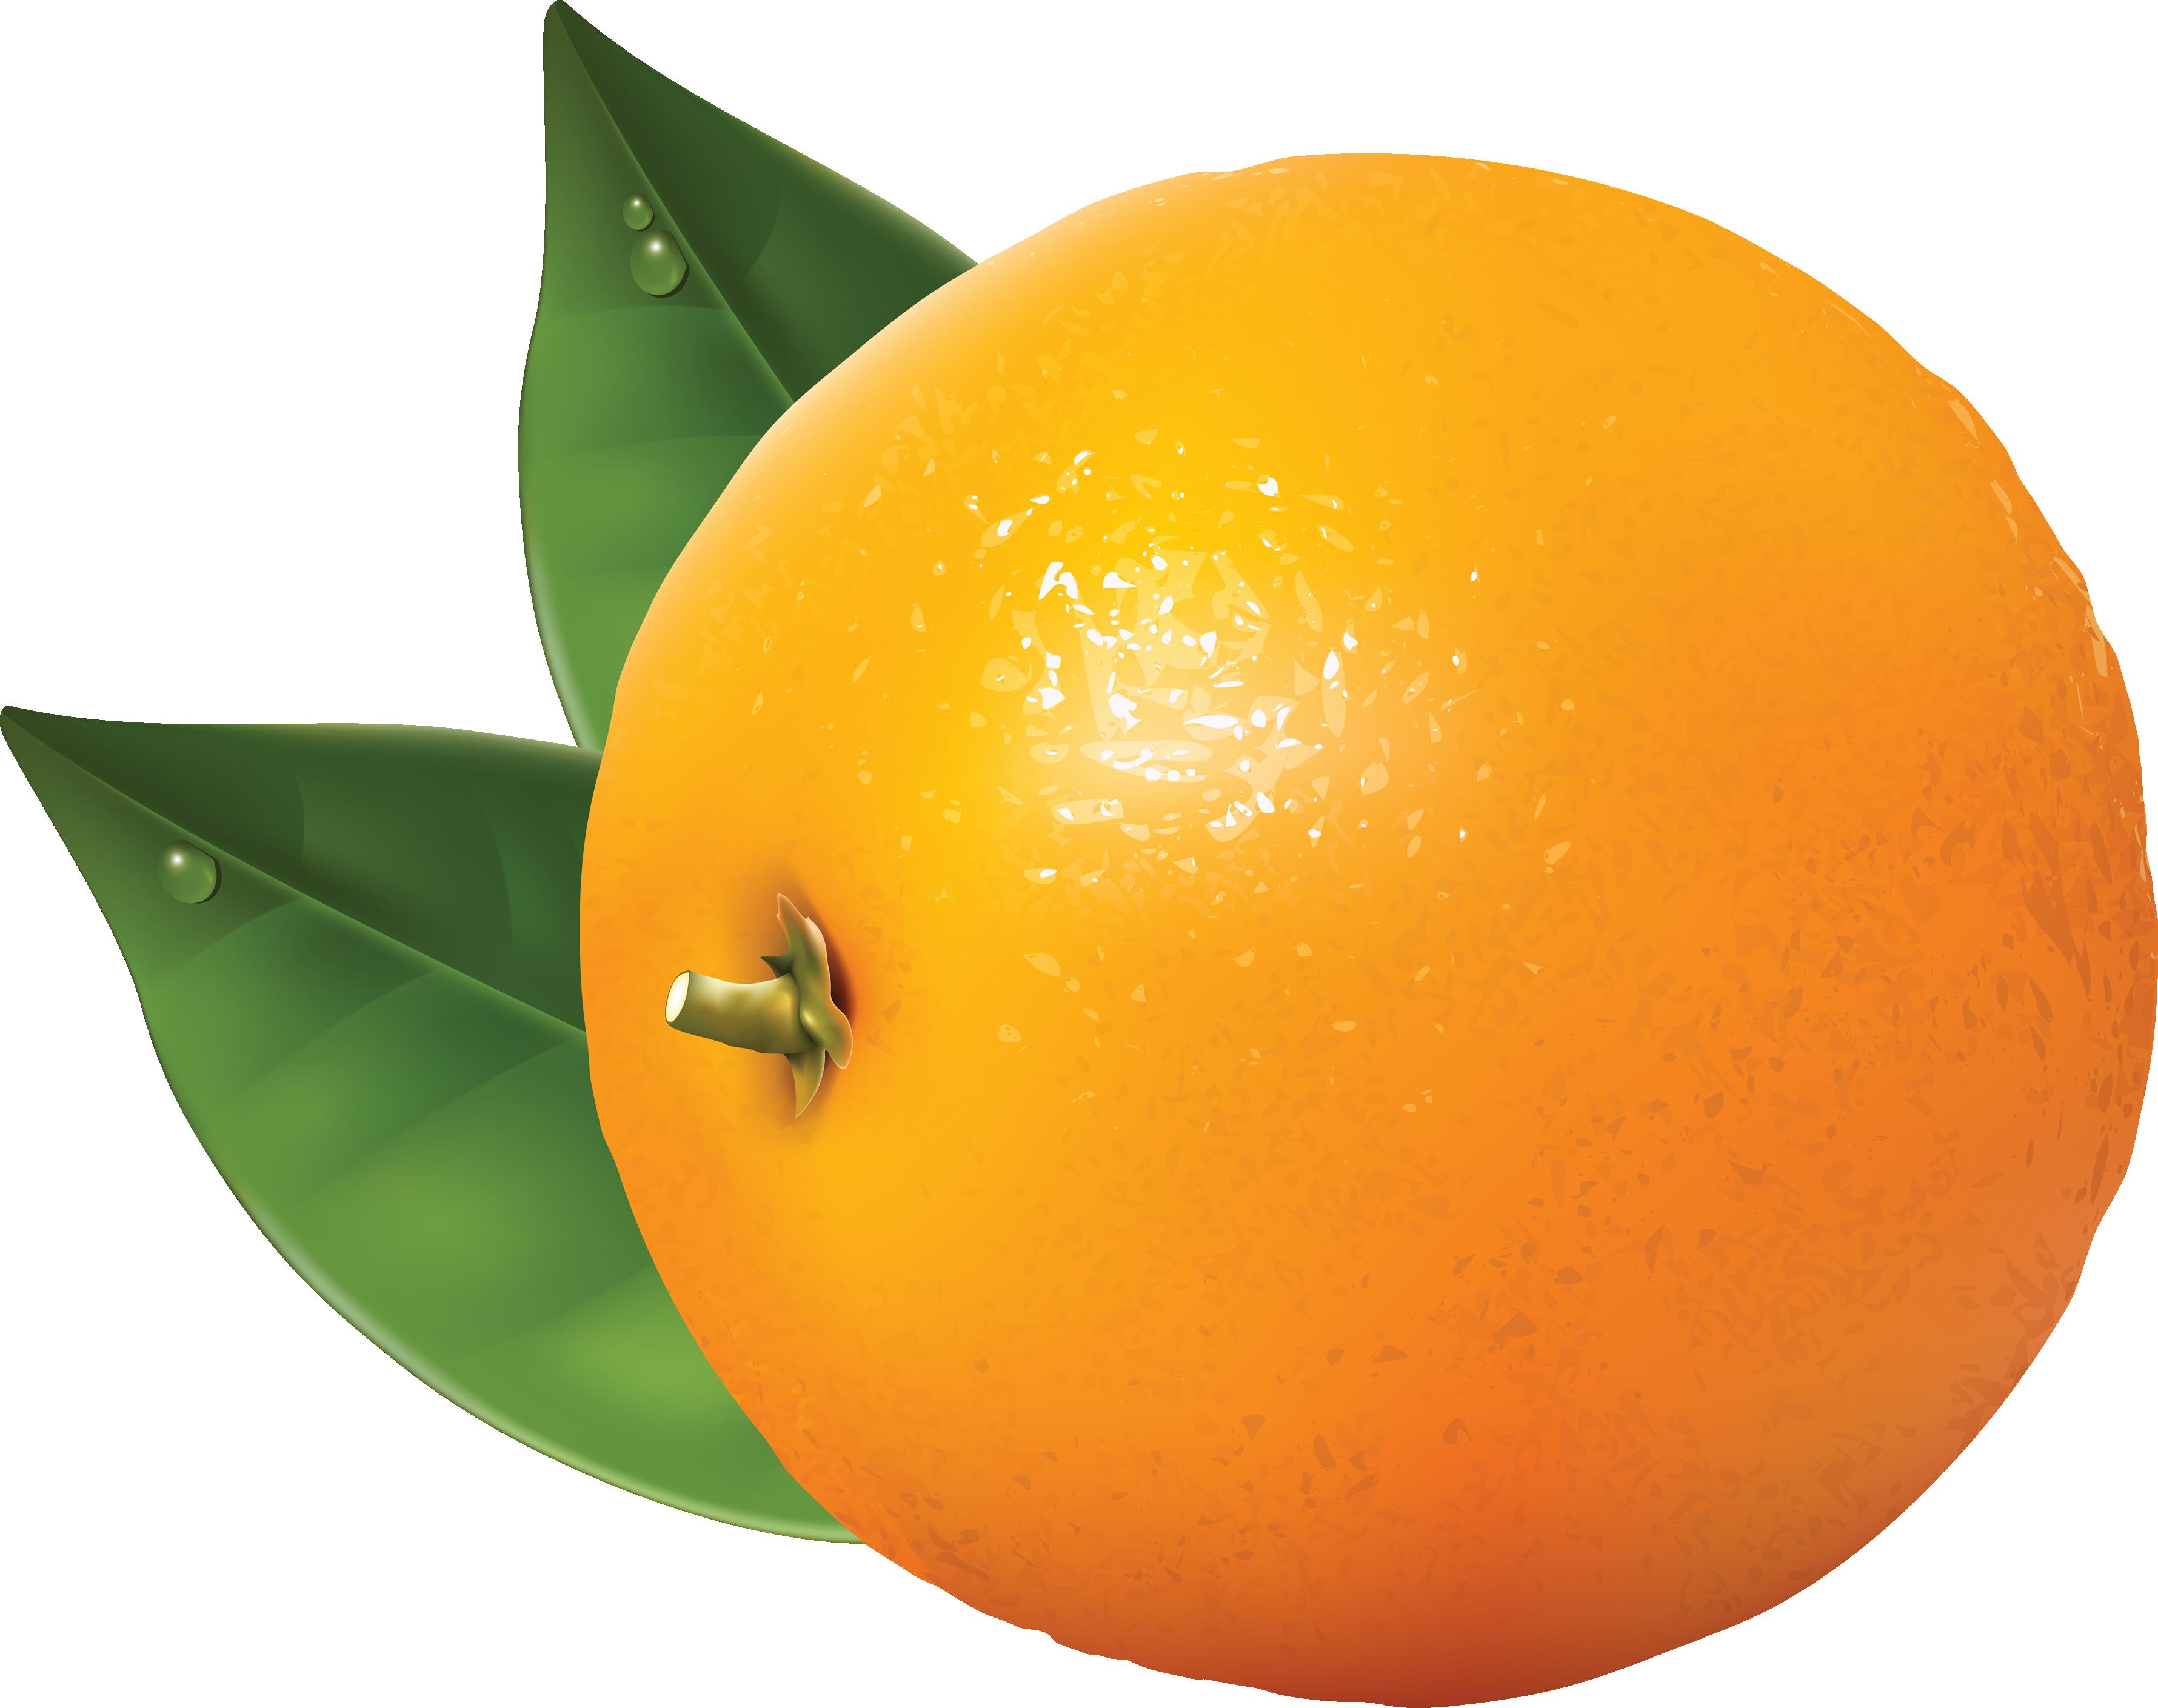 Orange free clipart png transparent download Orange Clip Art Free | Clipart Panda - Free Clipart Images png transparent download